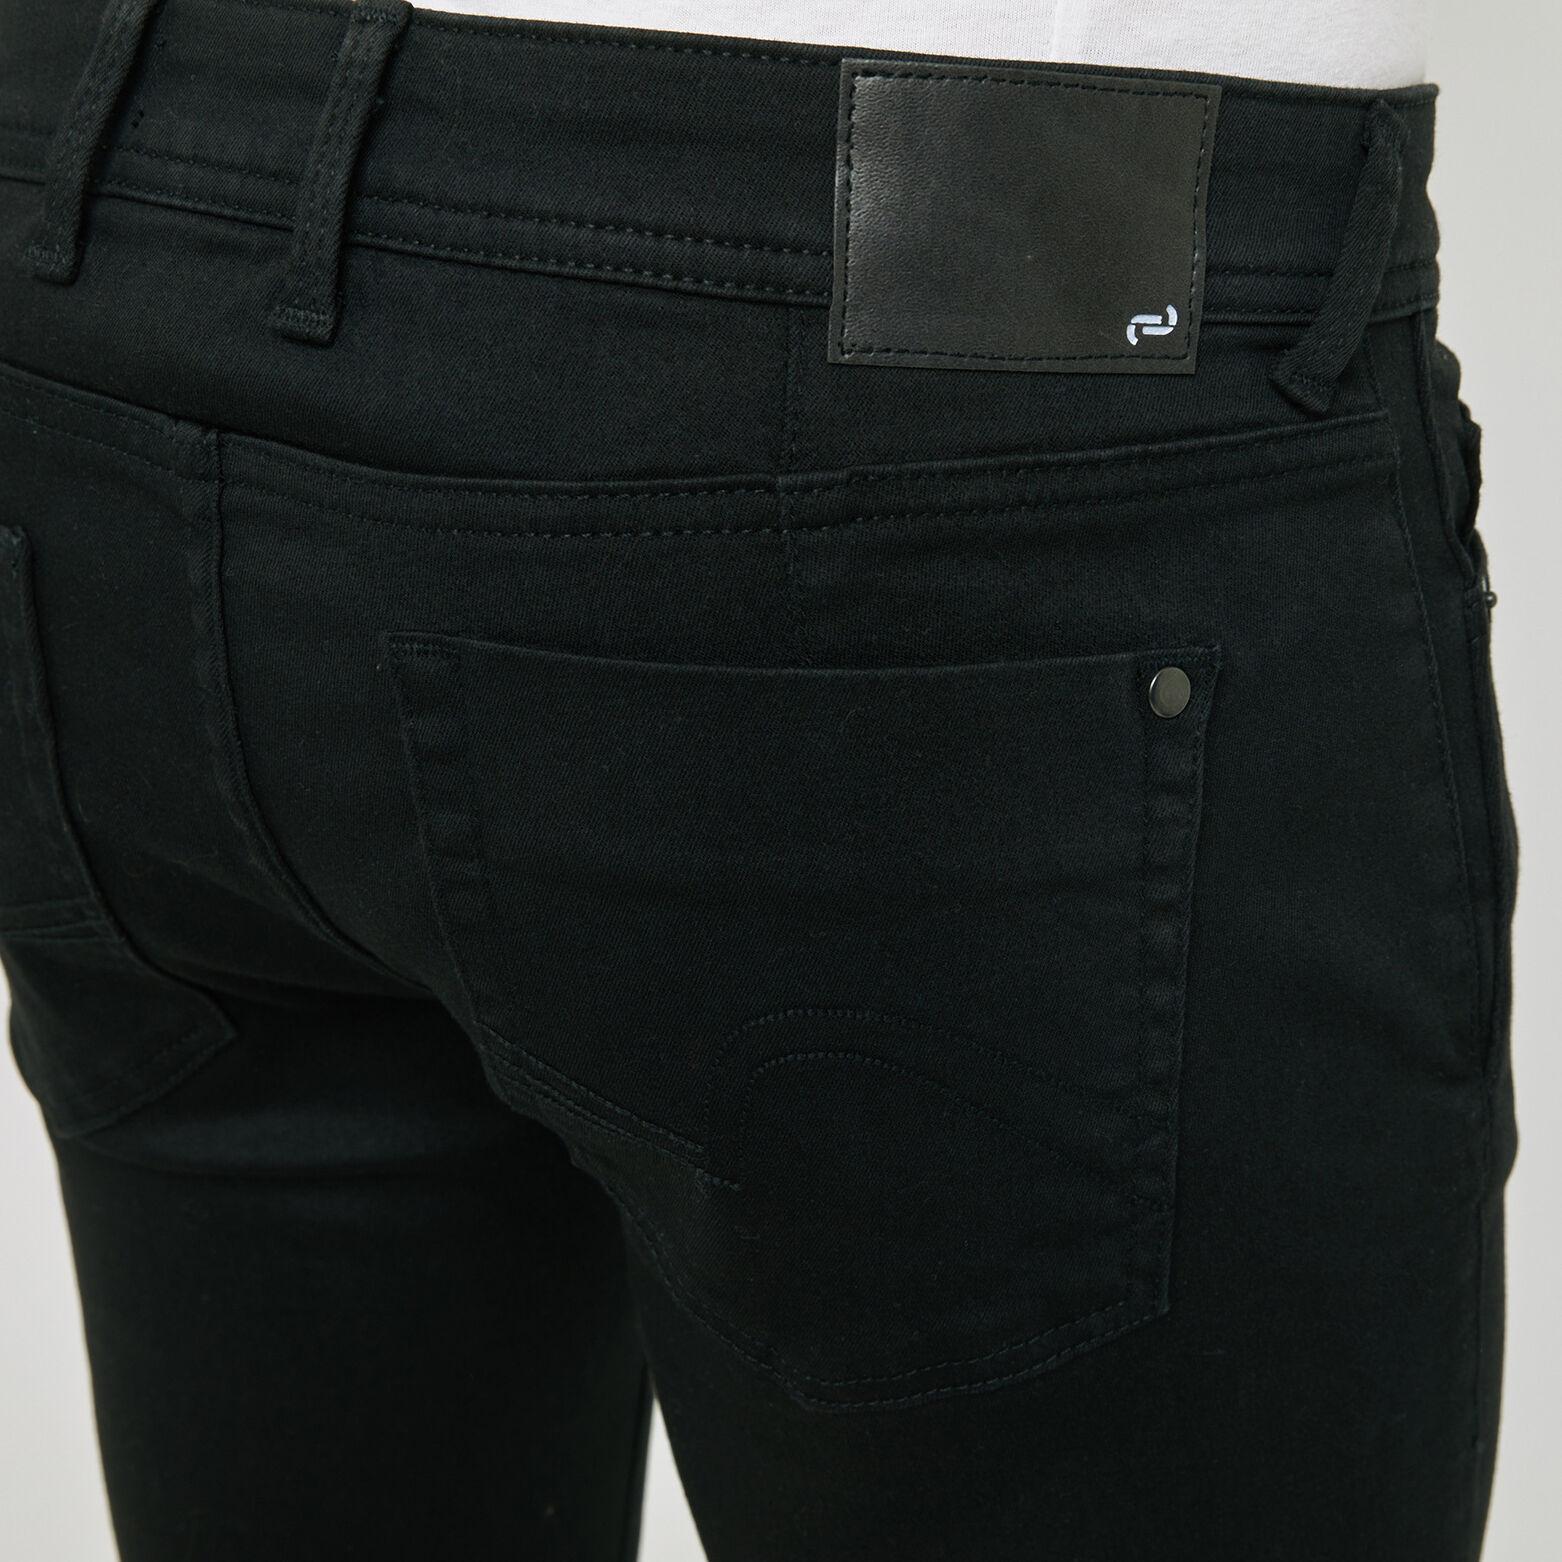 Jean skinny #max urbanflex stay black